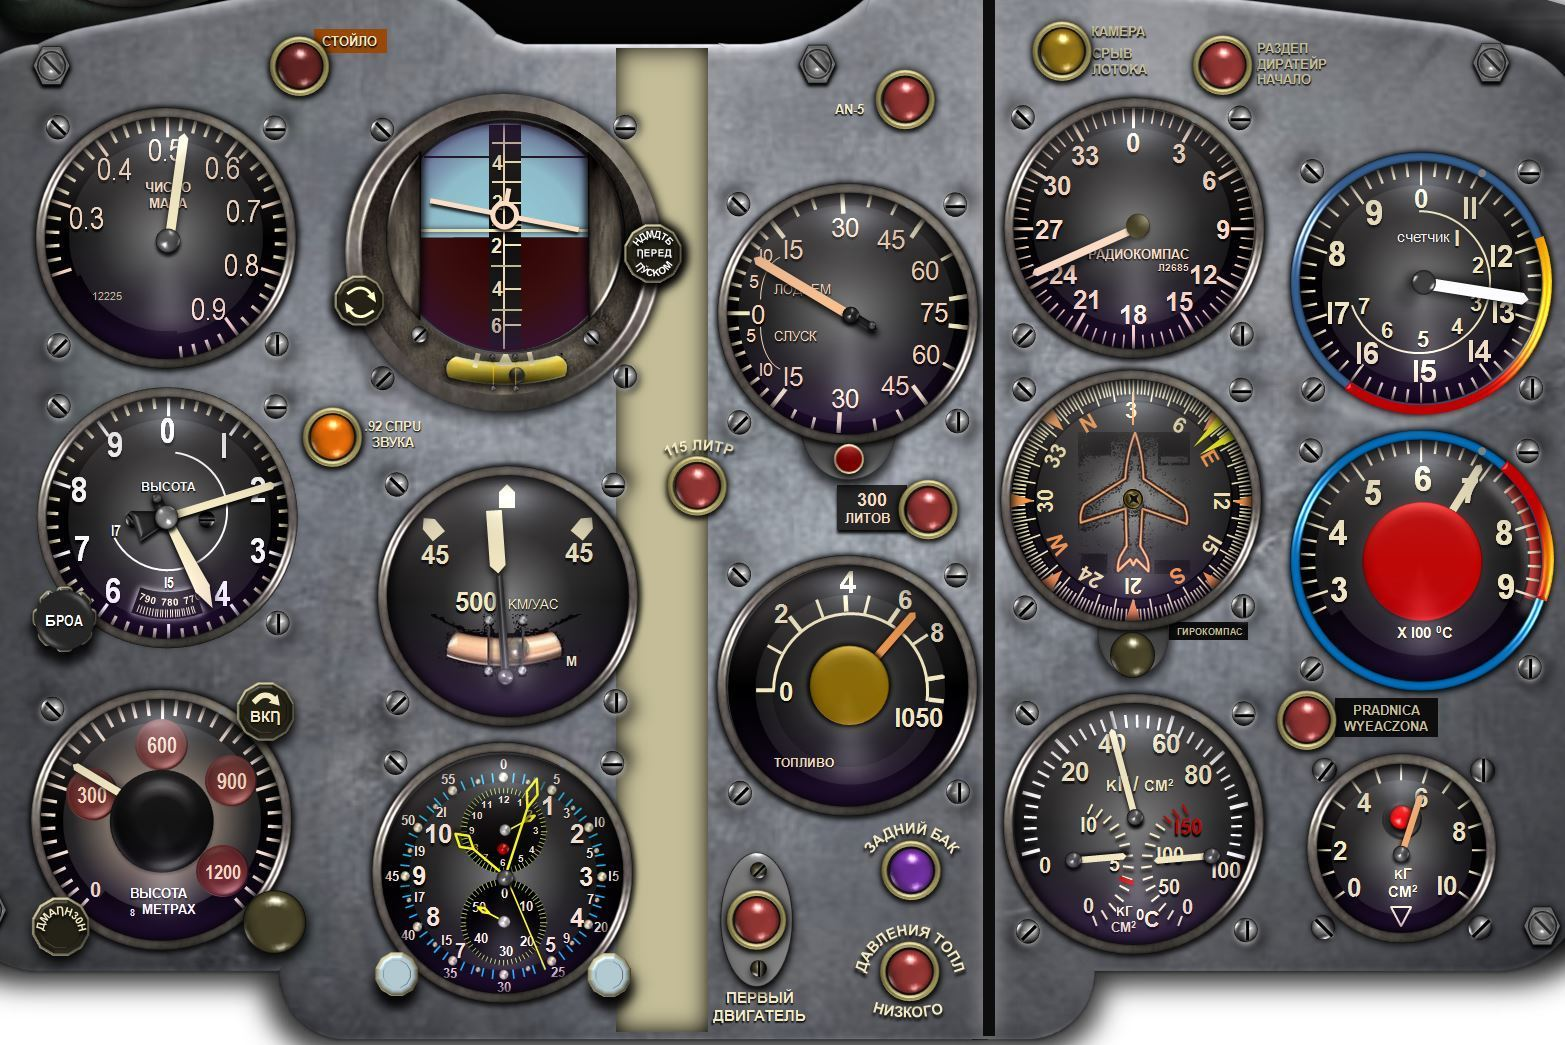 Click image for larger version  Name:MiG15-MiG17-SERIES-COCKPIT-instrument-panel-CDkit-_57-5.jpg Views:44 Size:275.1 KB ID:2250525